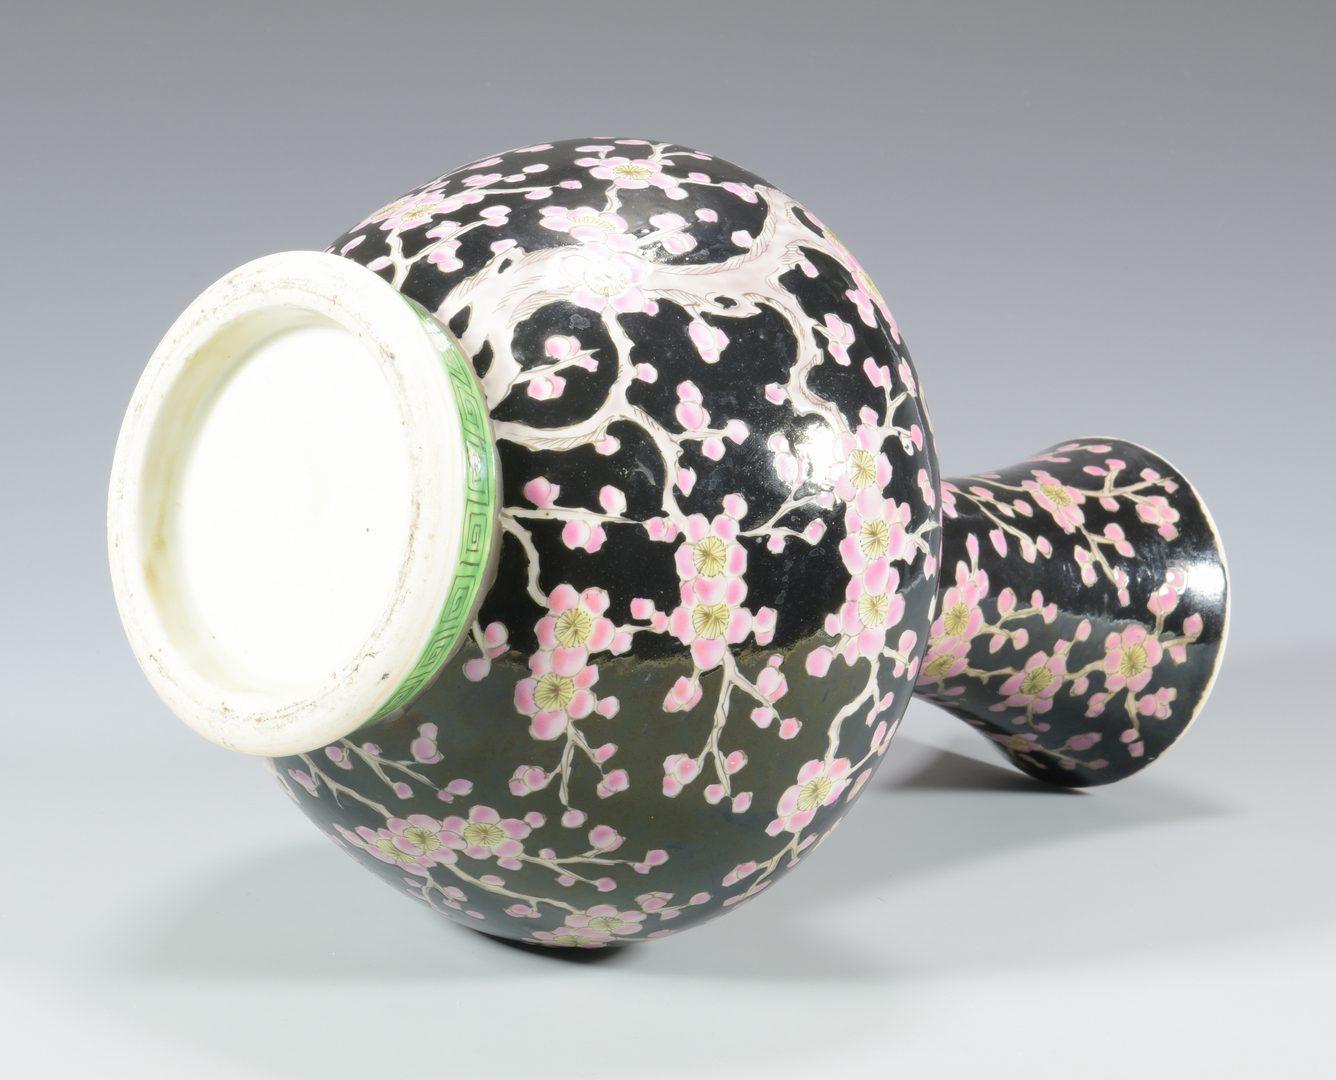 Lot 342: Chinese Famille Noir Porcelain Vase